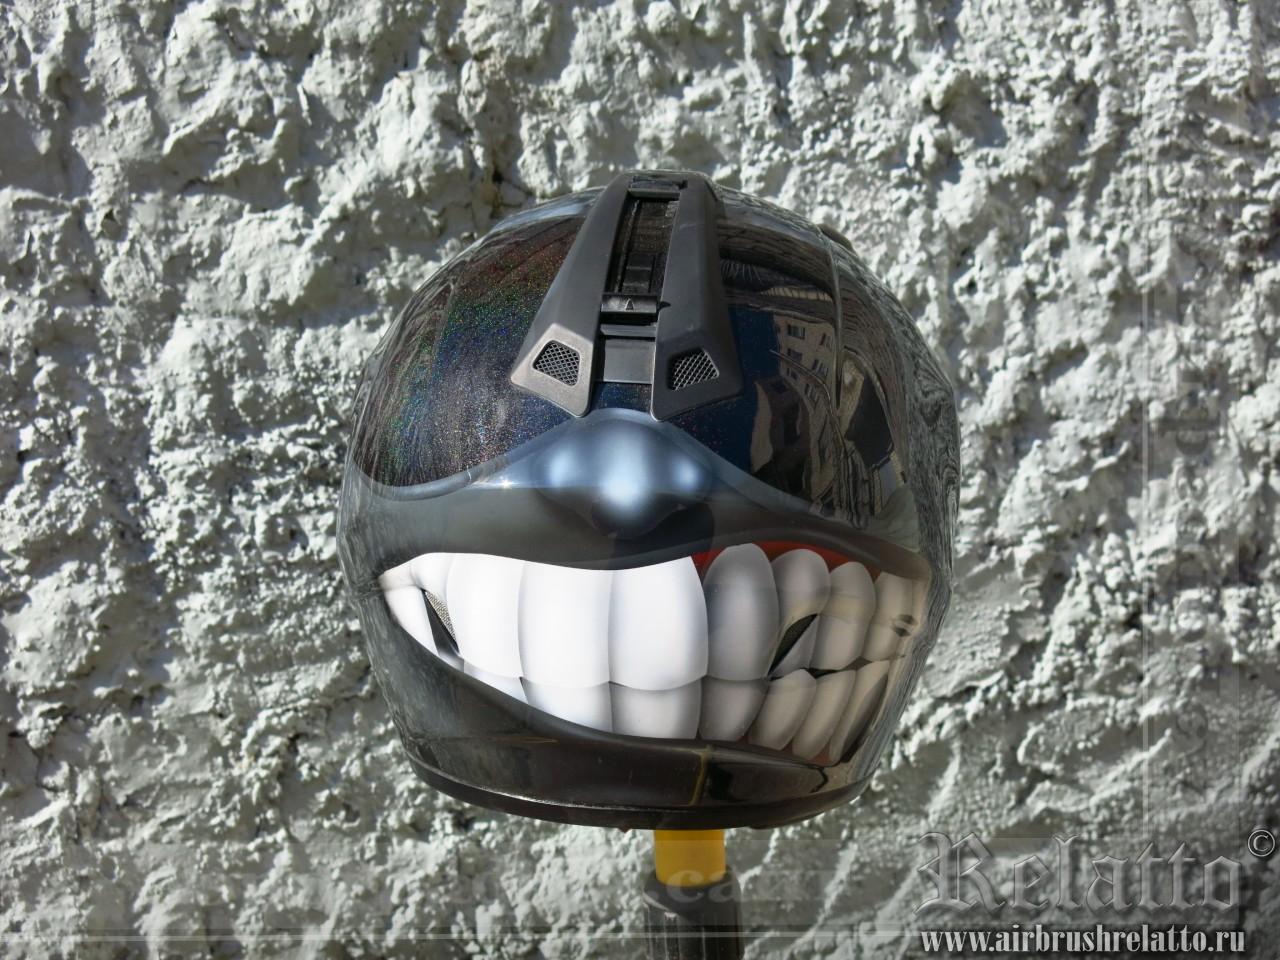 аэрография шлема - угарный тип